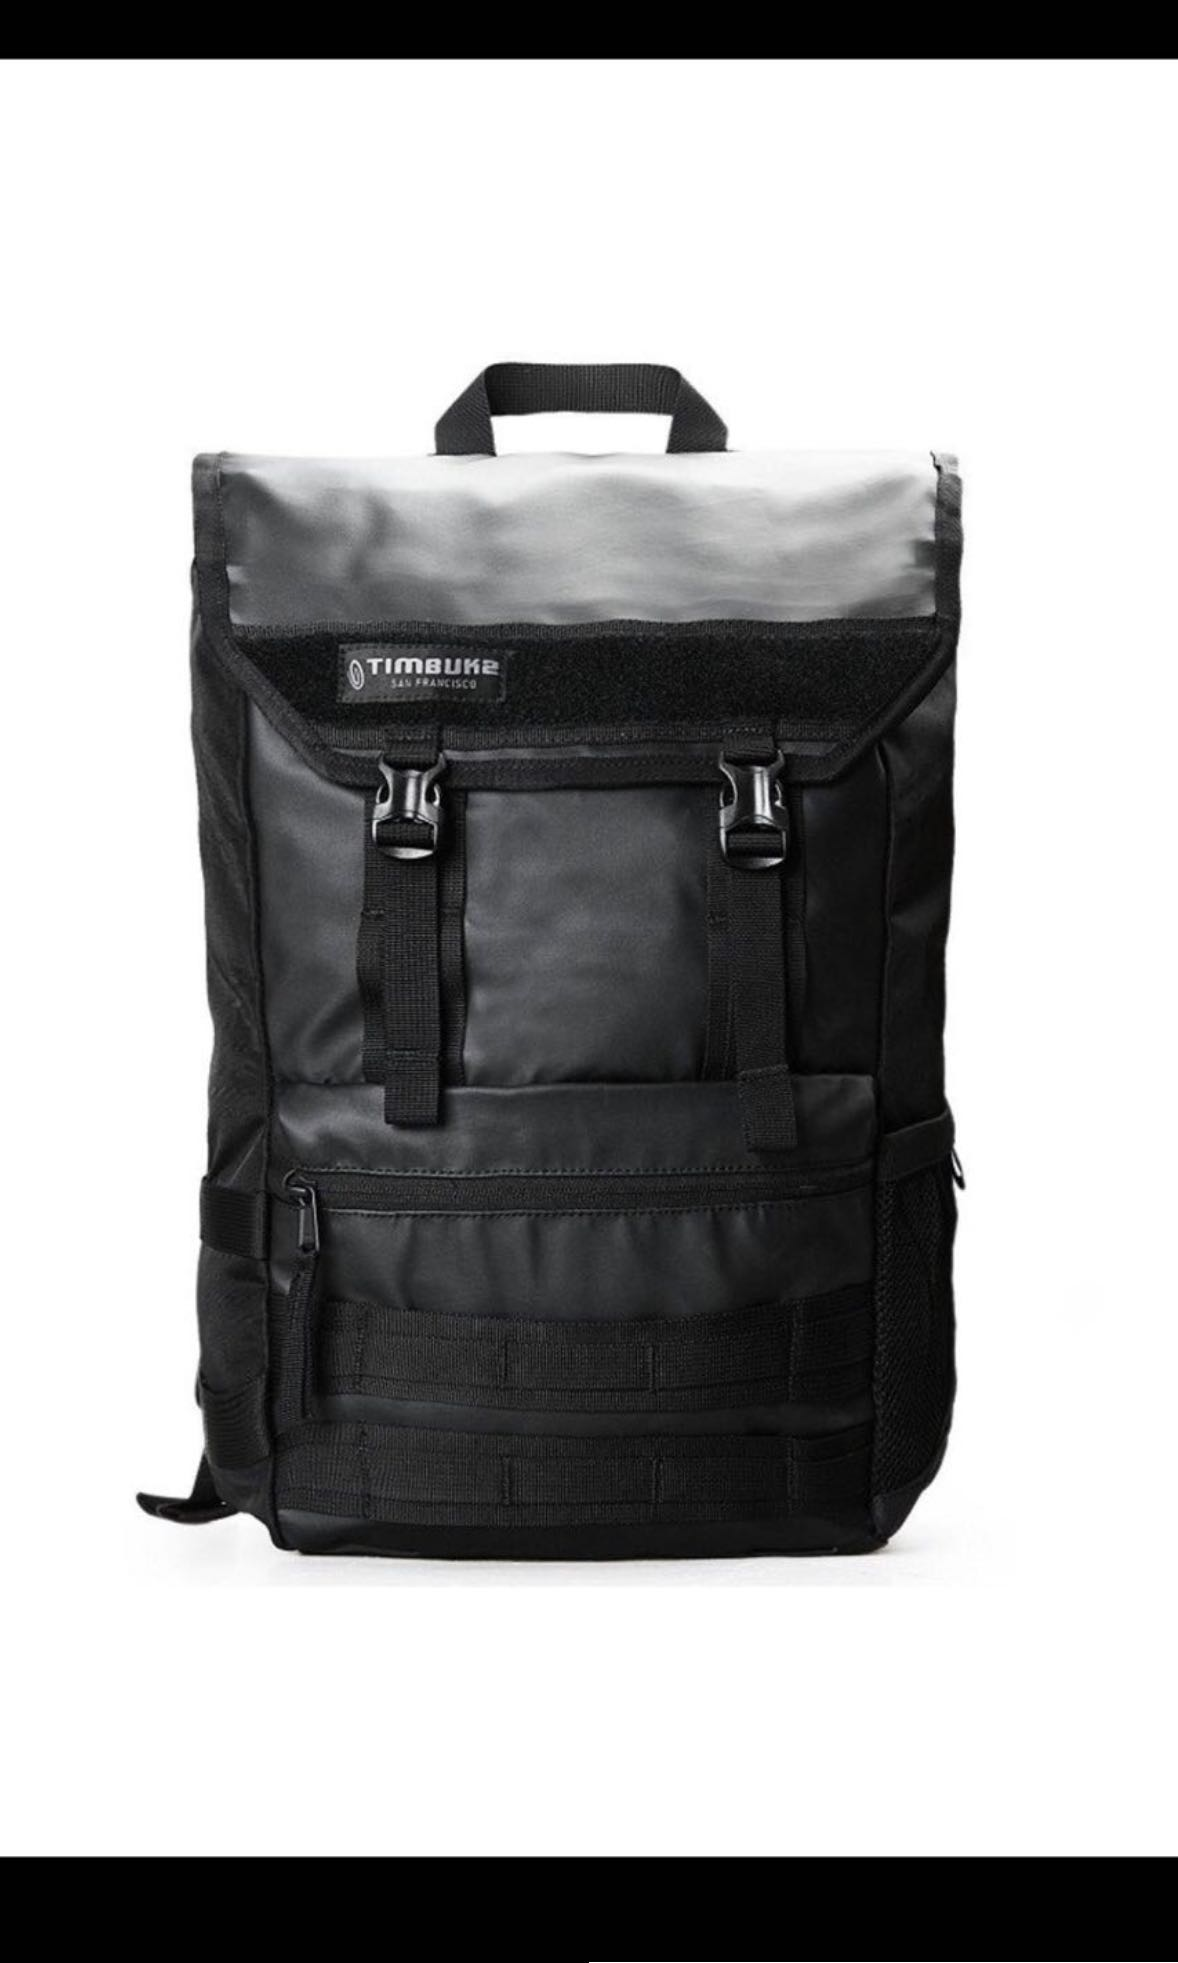 Timbuk2 Rogue Backpack , Men s Fashion, Bags   Wallets, Backpacks on  Carousell 031f176bd9